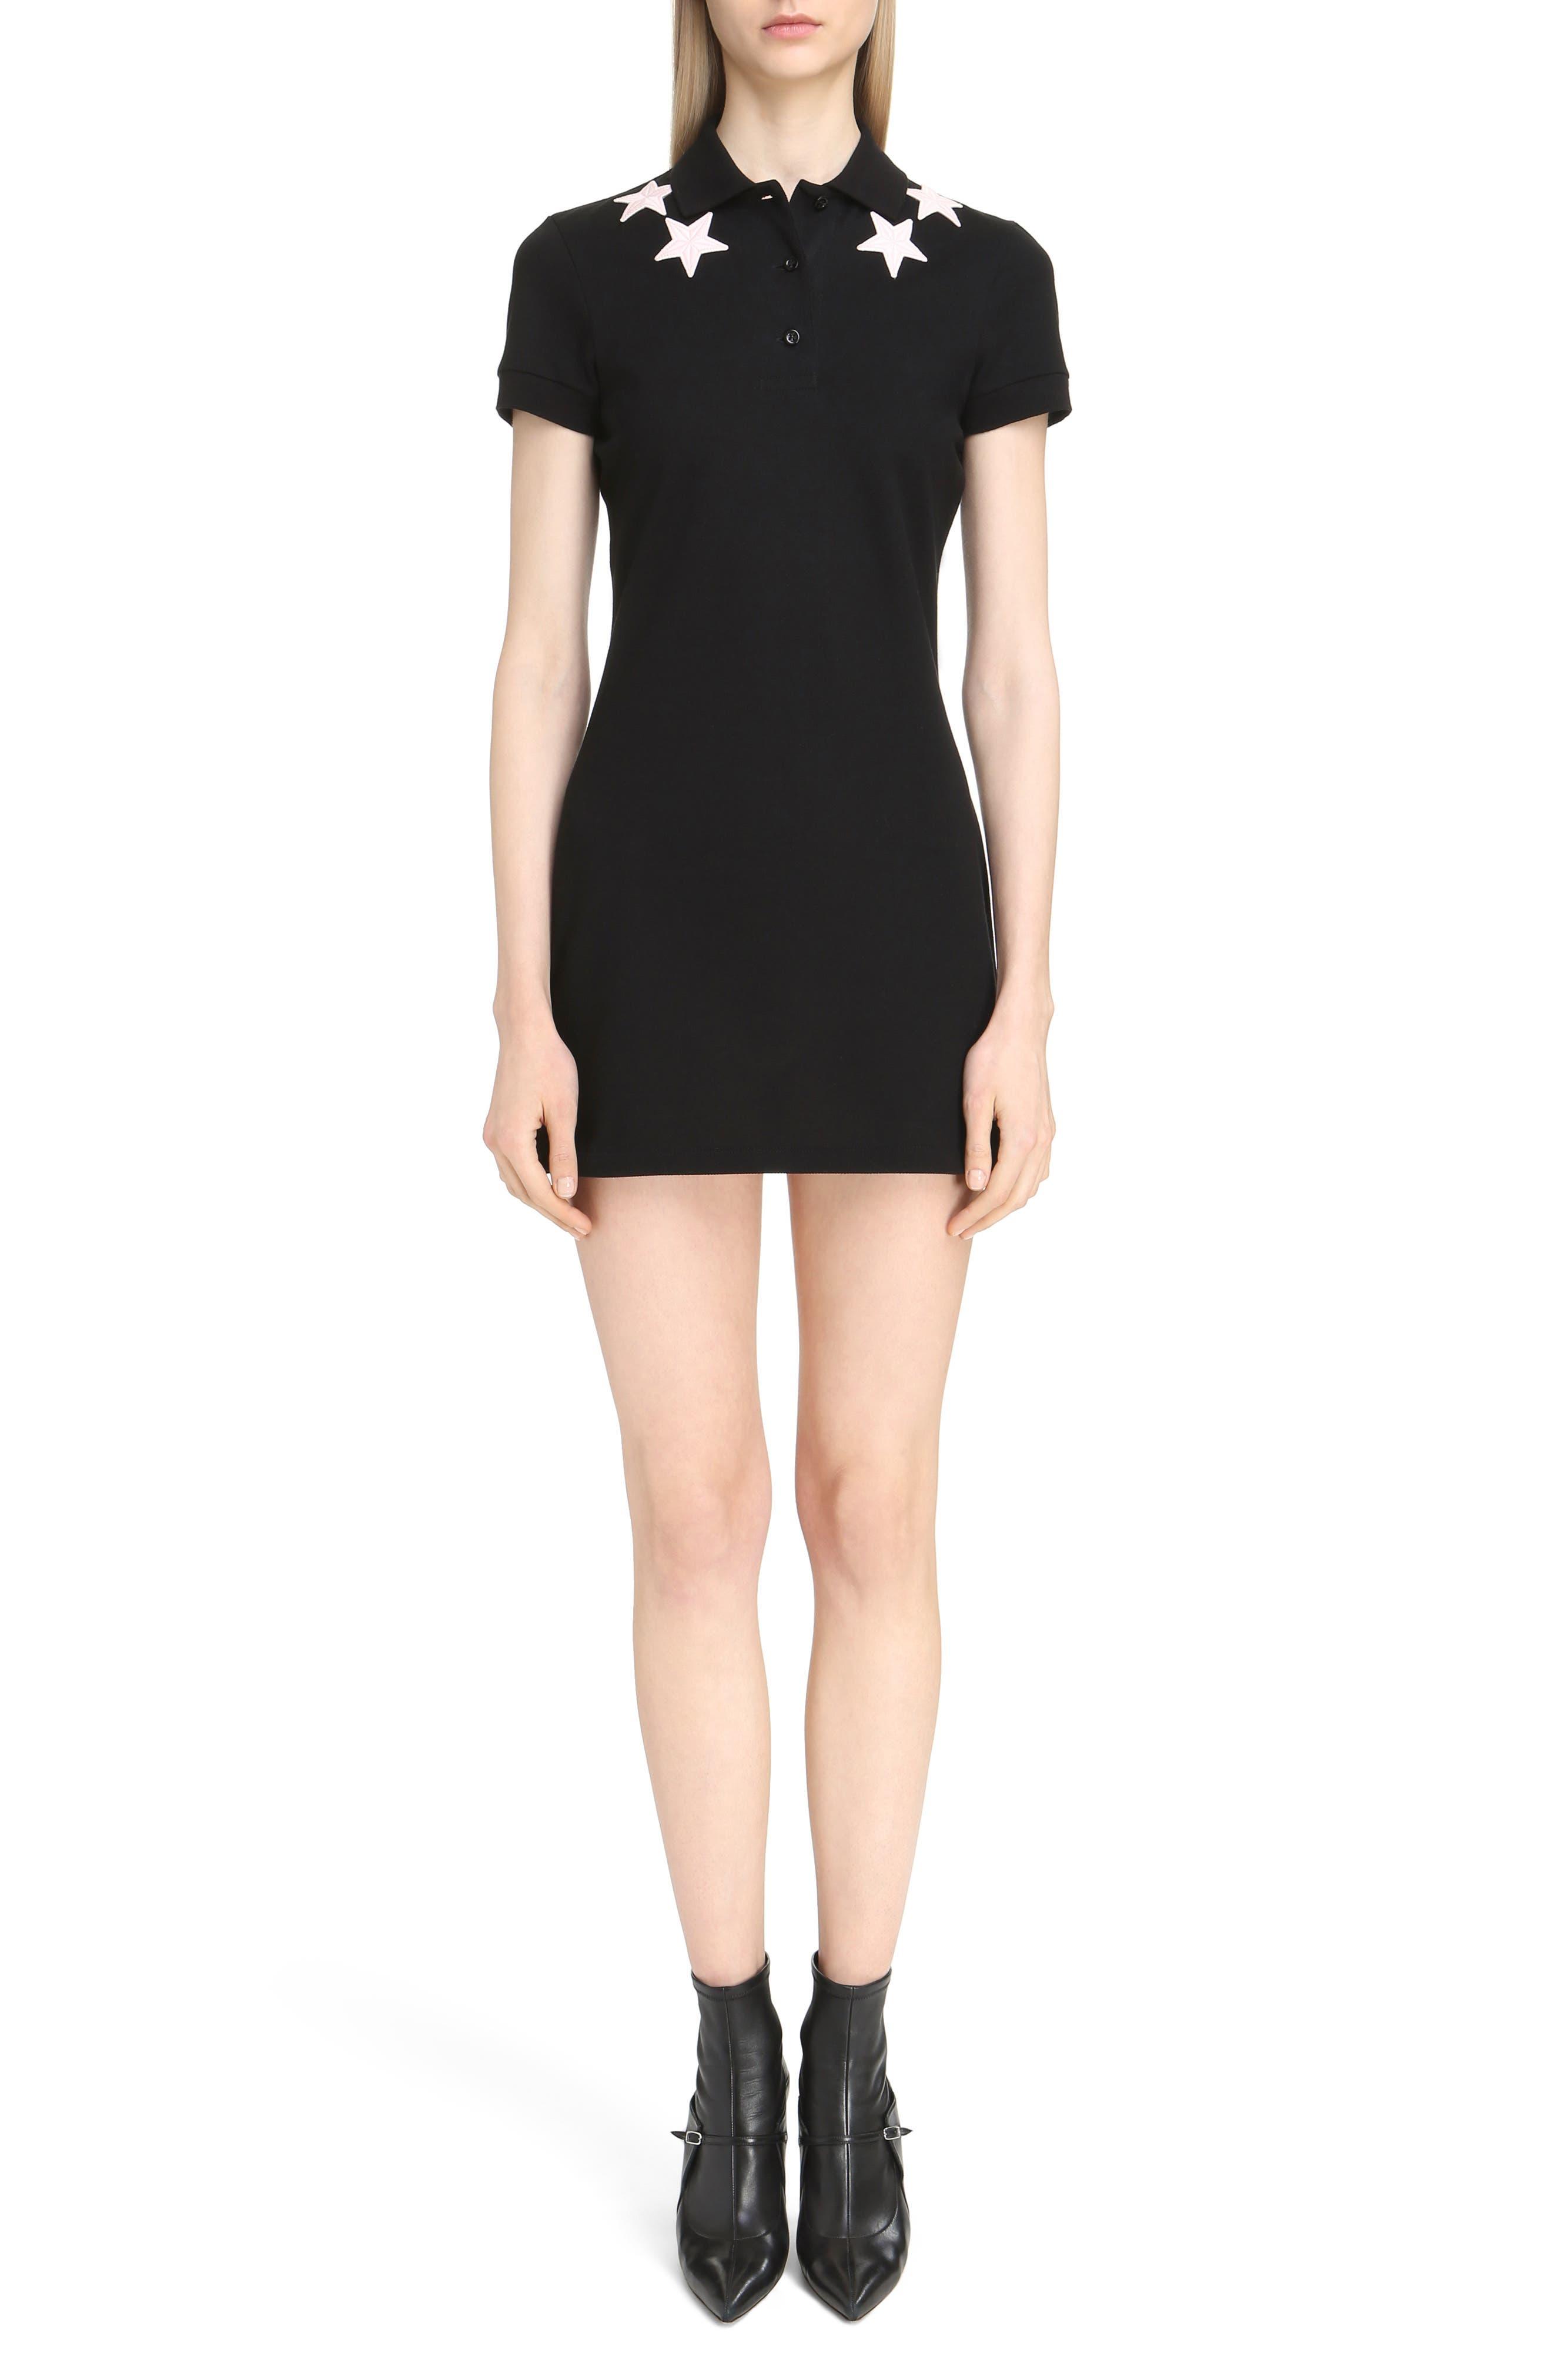 Alternate Image 1 Selected - Givenchy Star Embellished Polo Dress